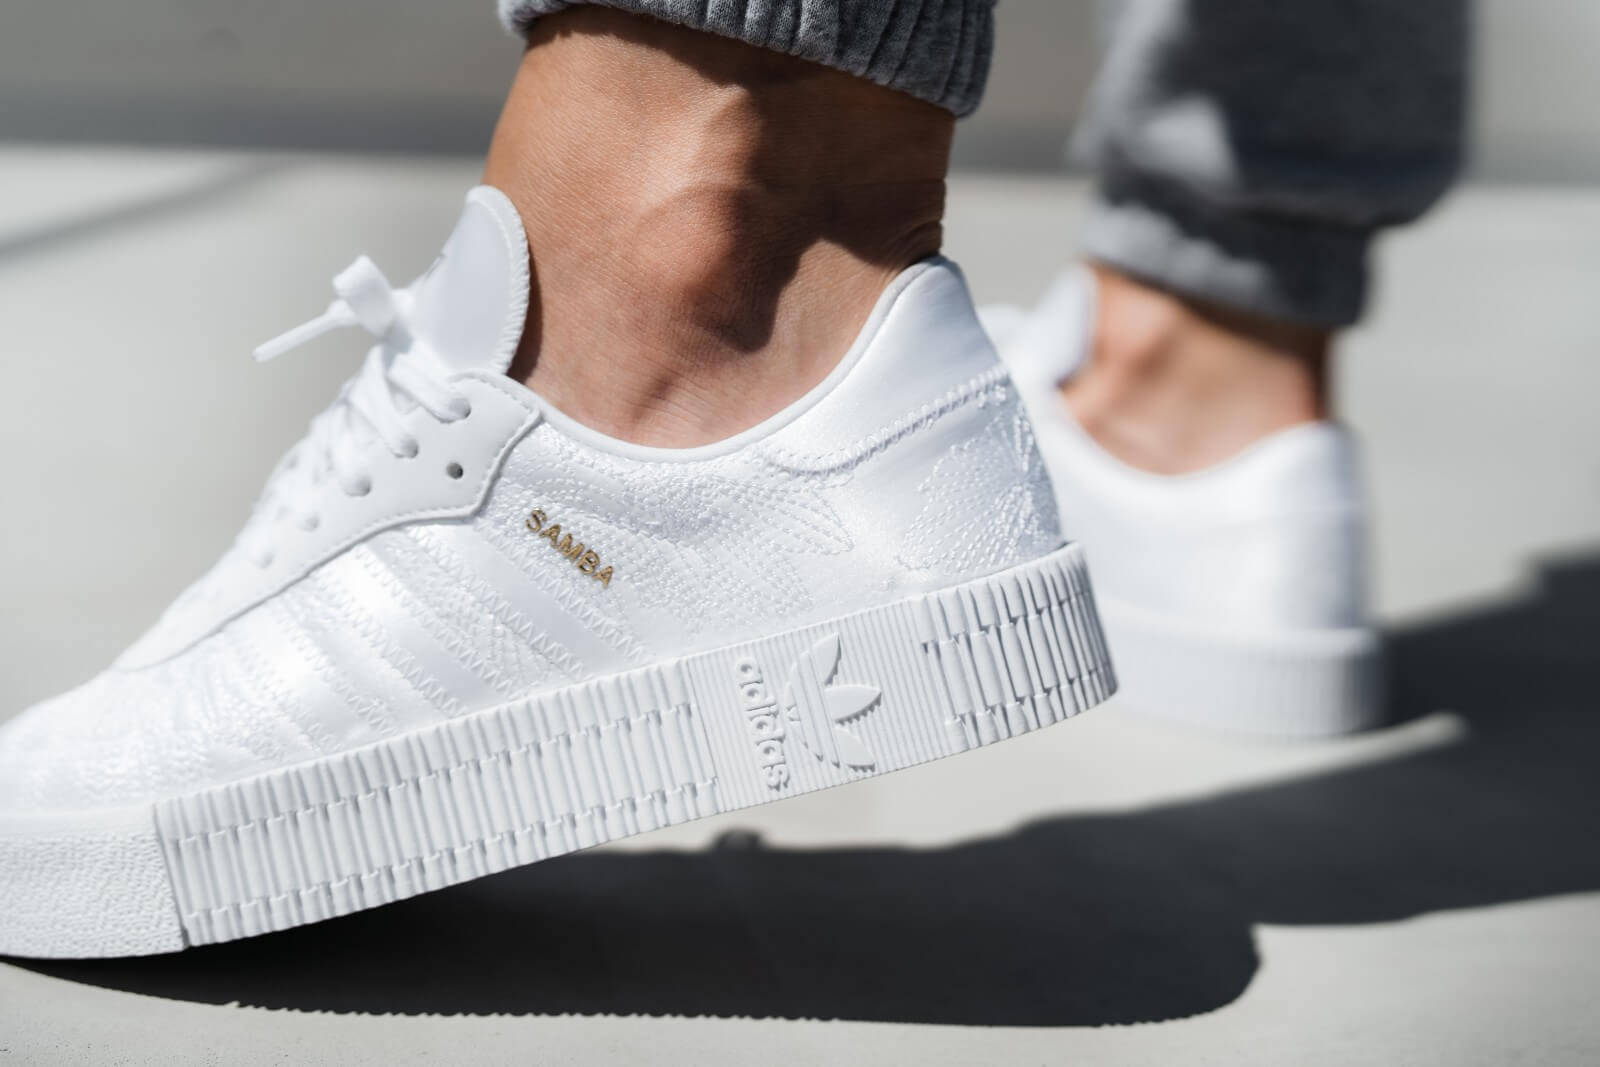 Adidas Women's Sambarose Cloud White